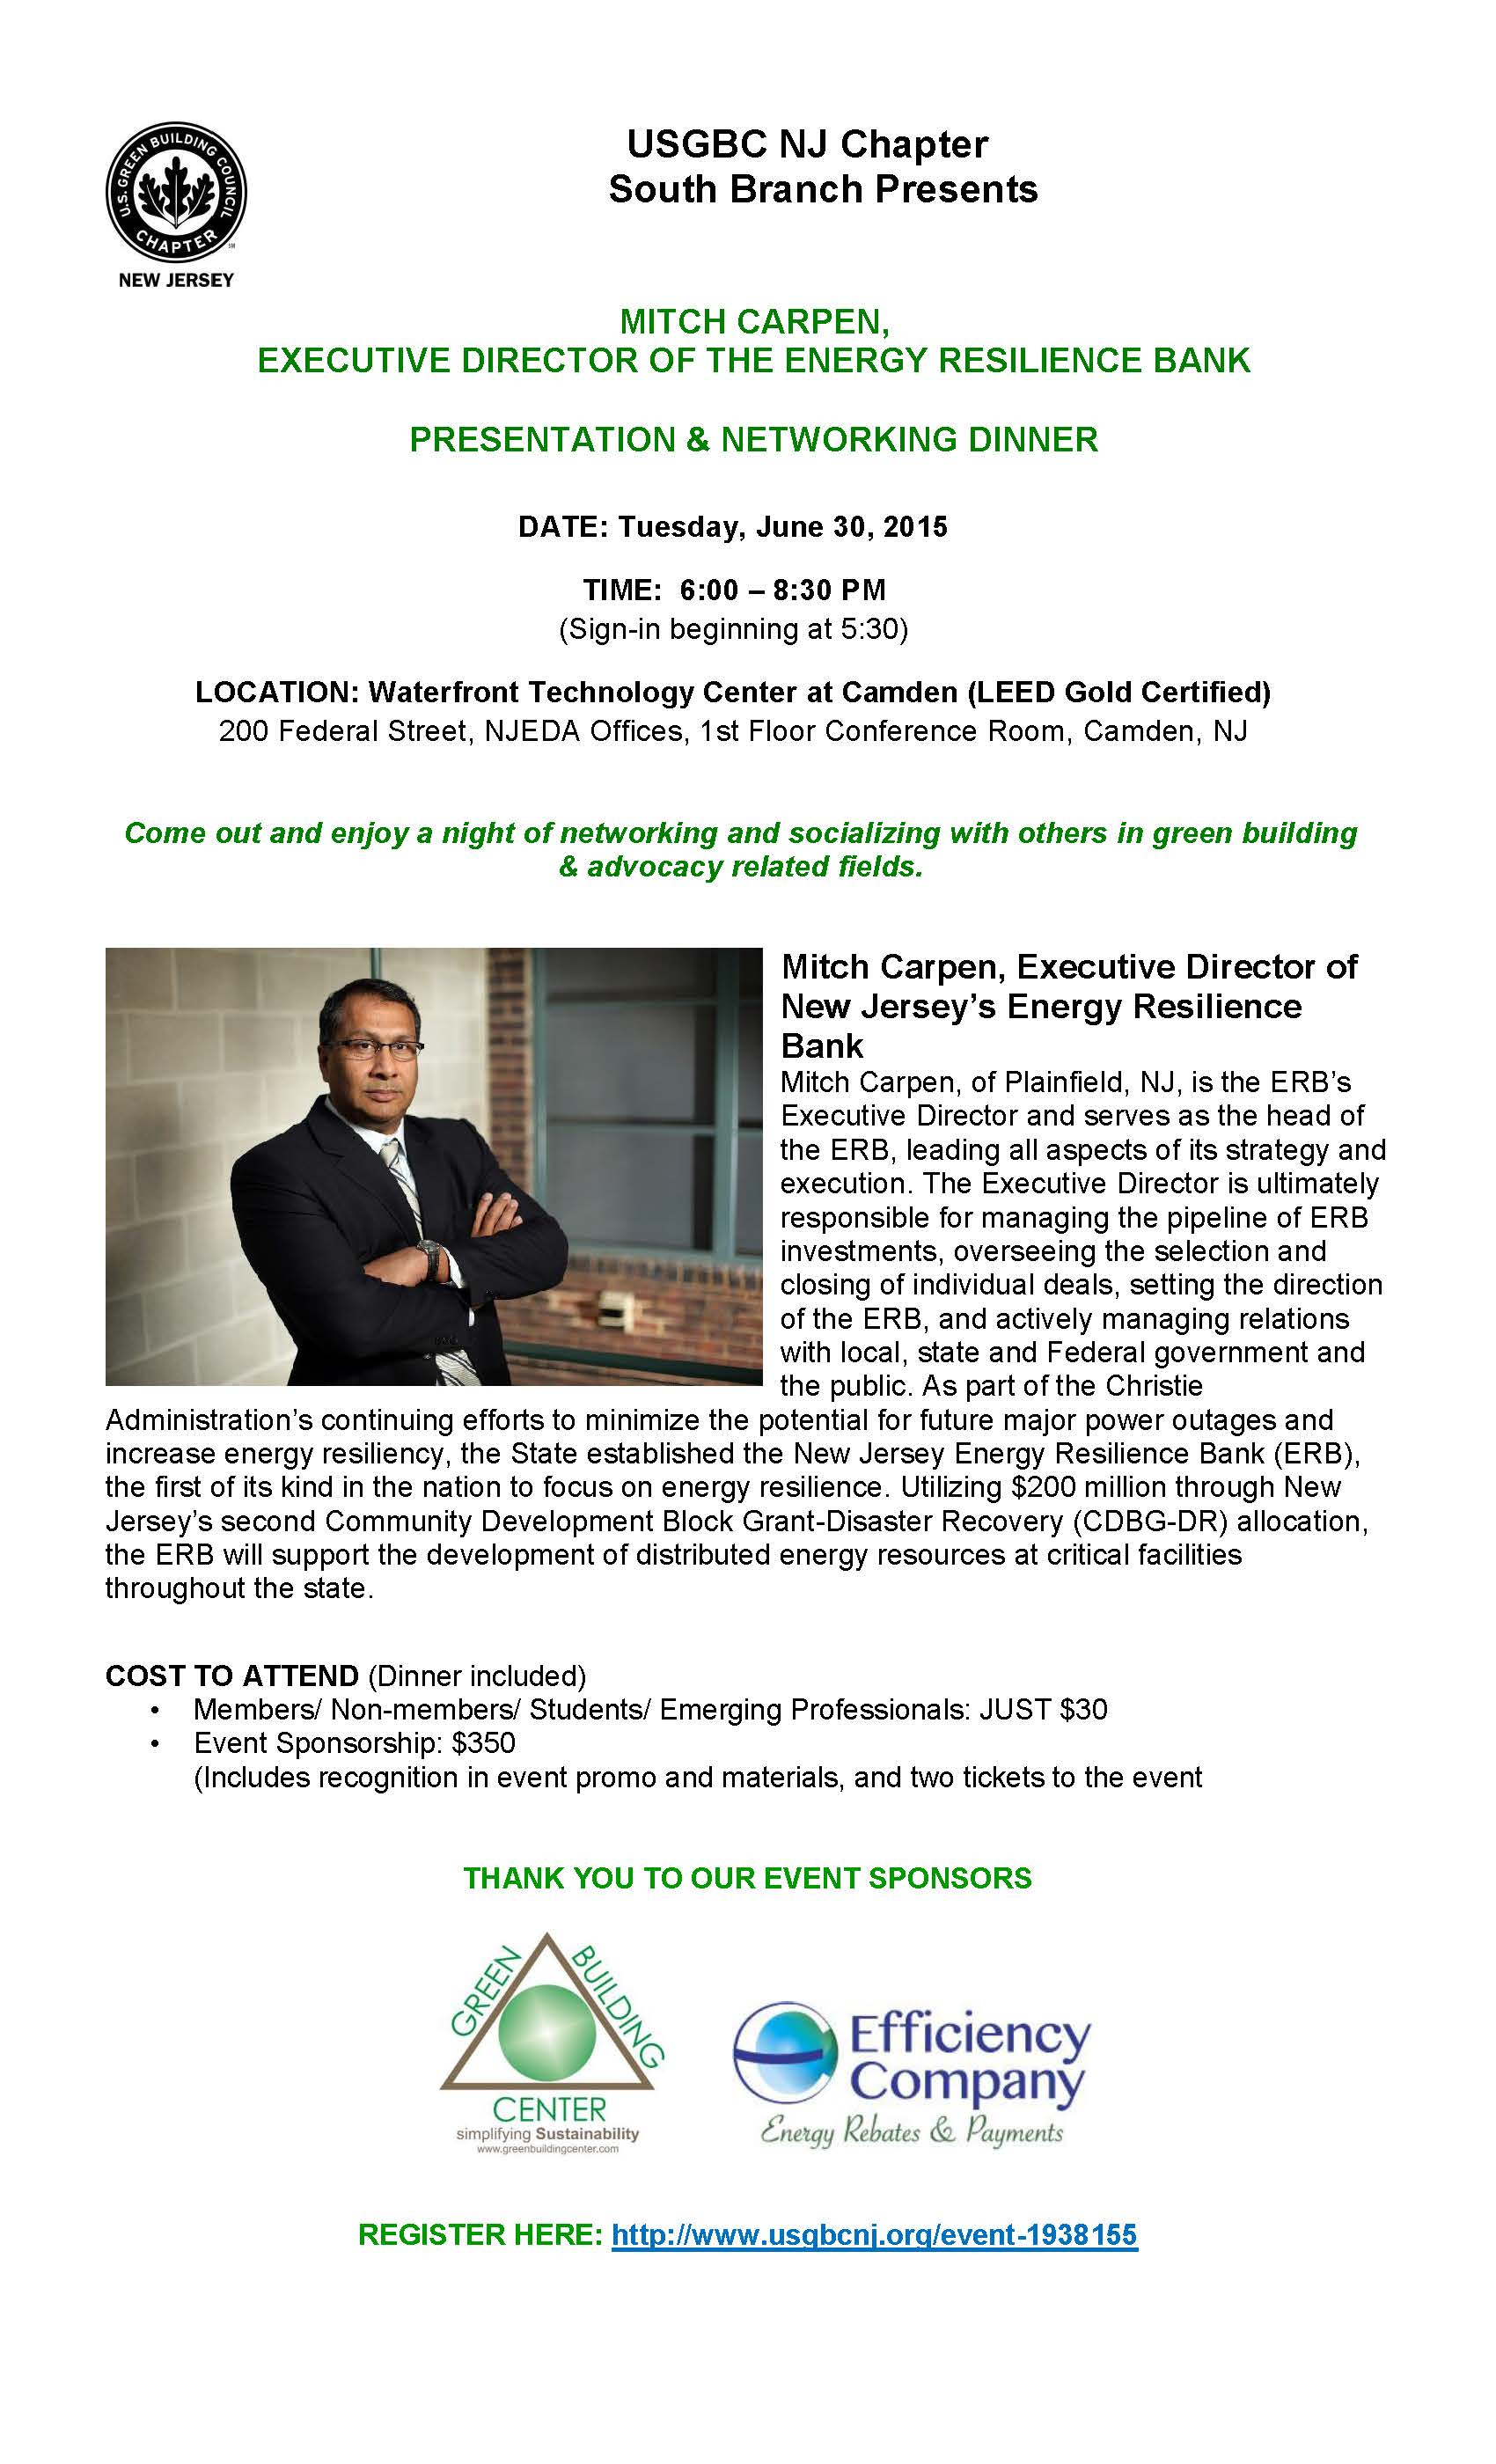 USGBC-NJ_South_Branch_event-6-30-15